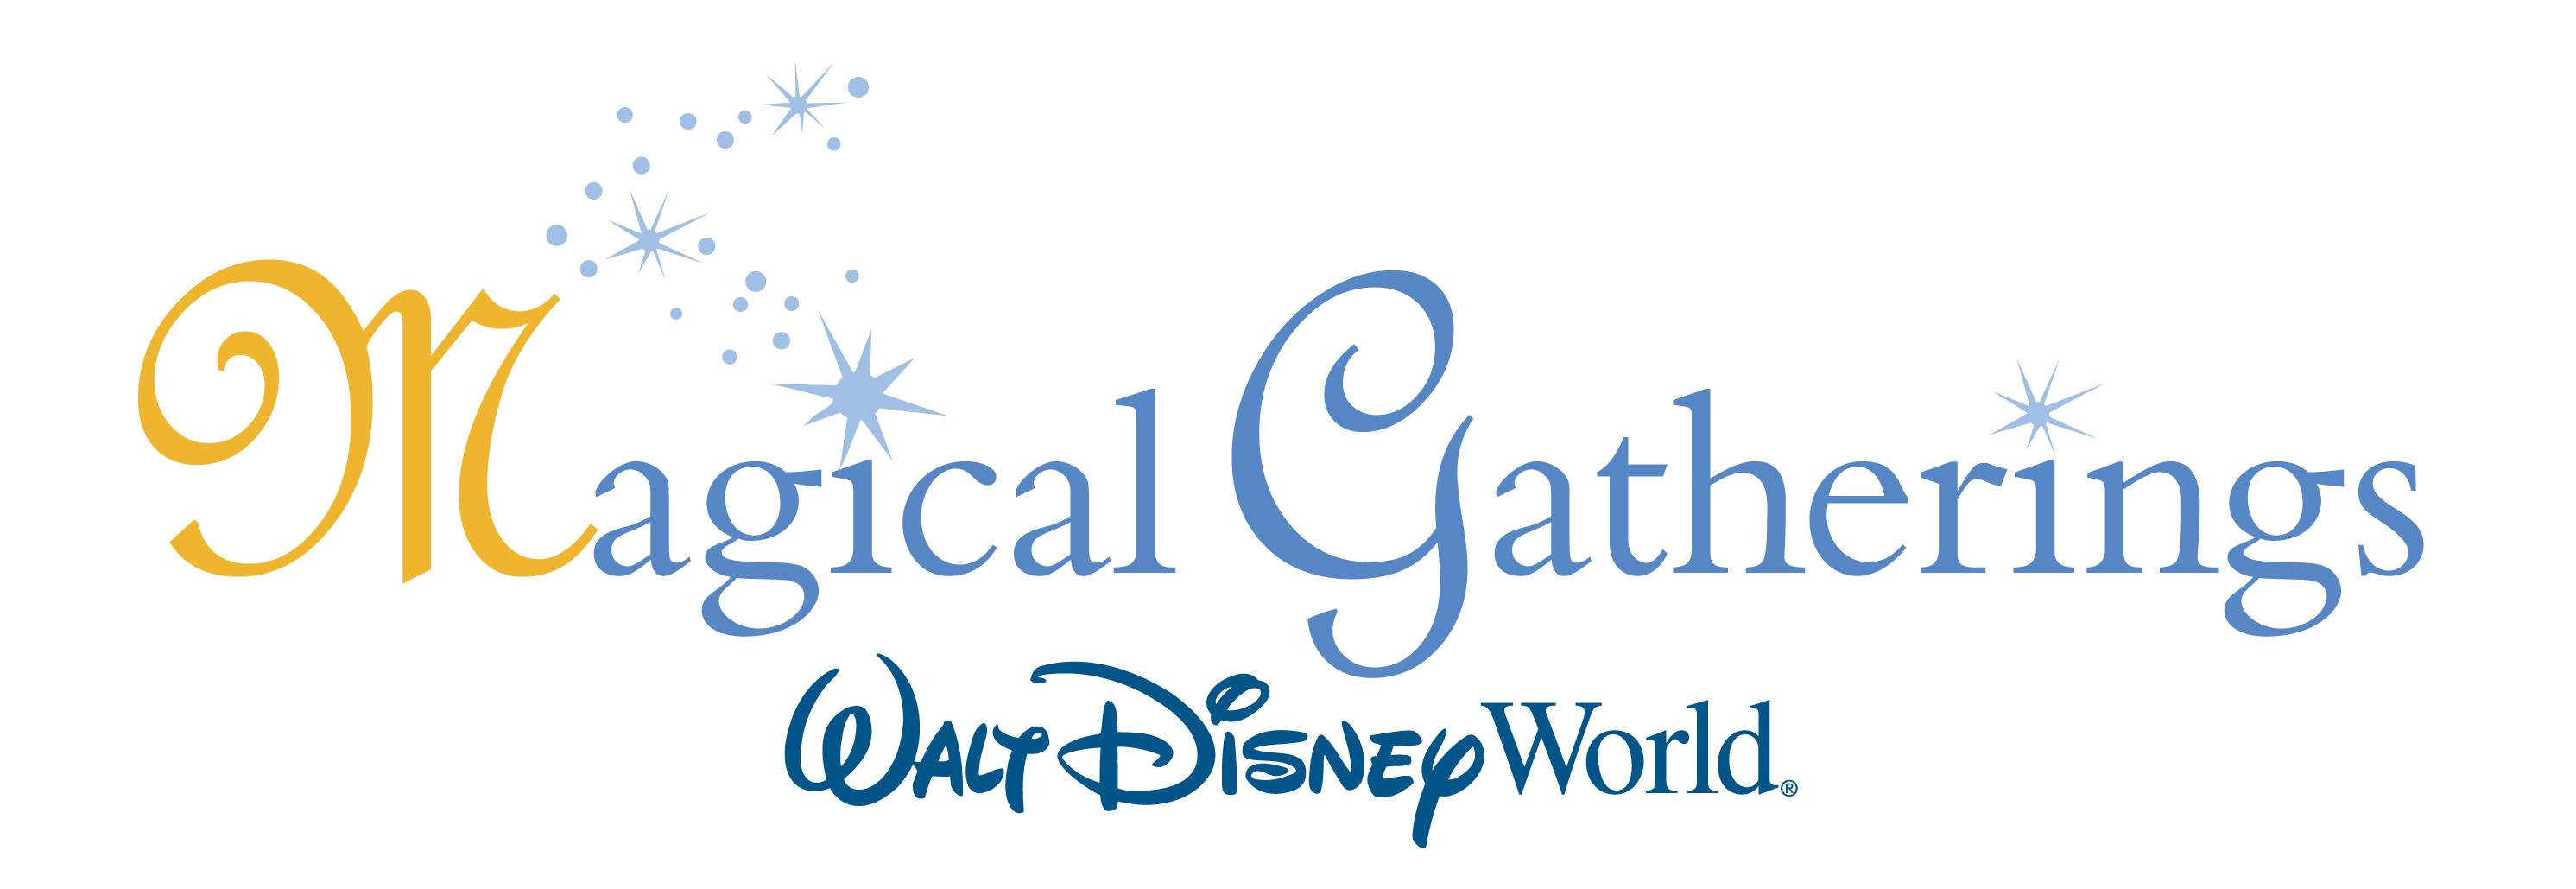 Magical Gatherings Logo 1896 Jpg 0kb #PfrnkI.